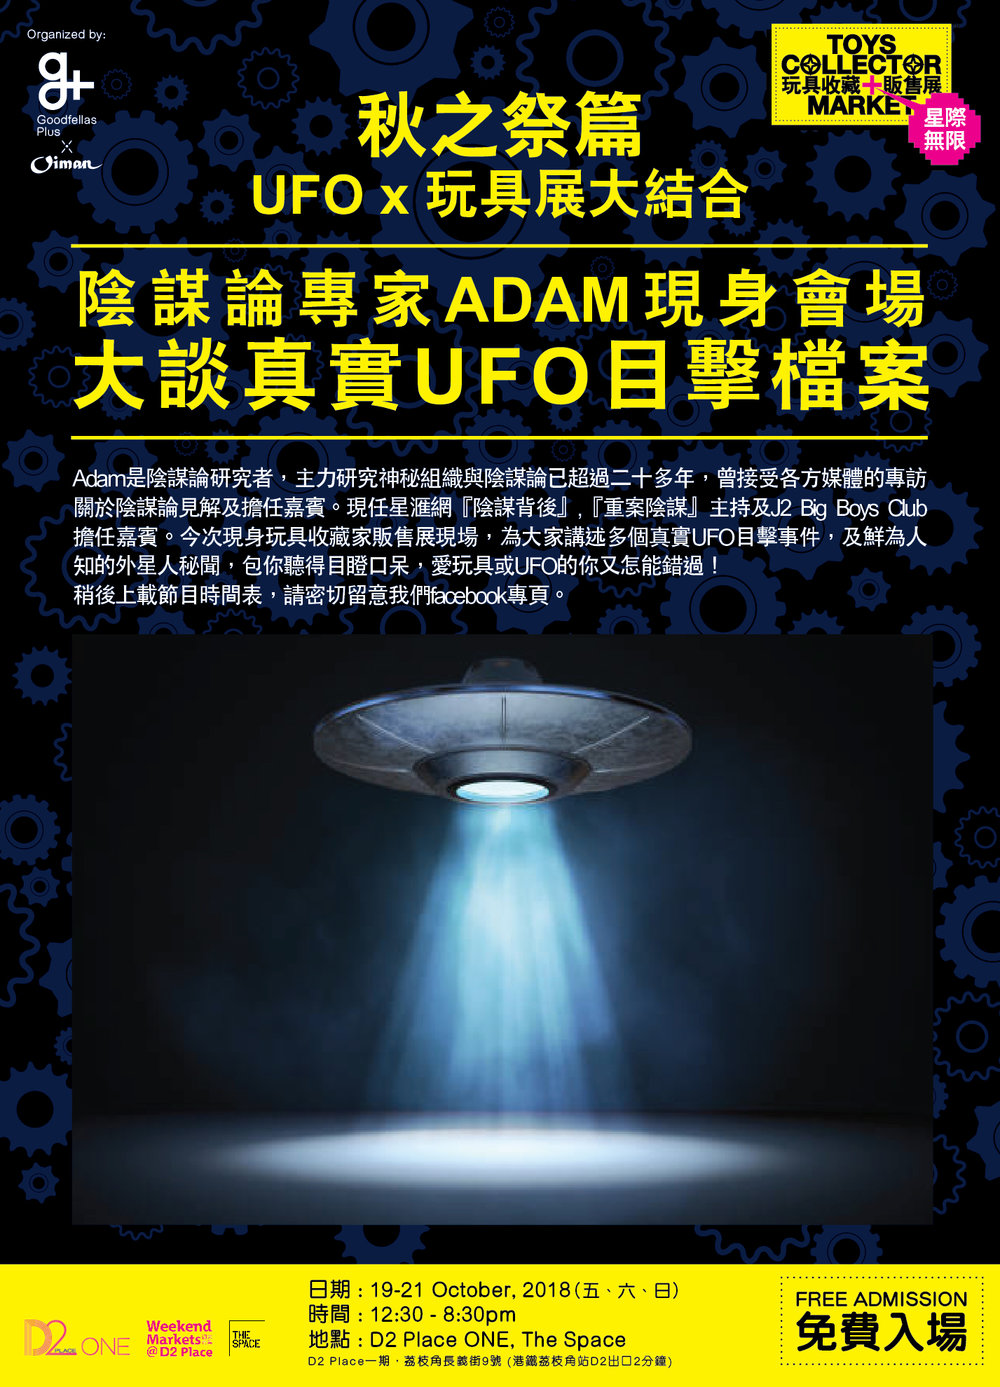 GFP-4thTCM-FBAD-685x950px-Event_Adam.jpg